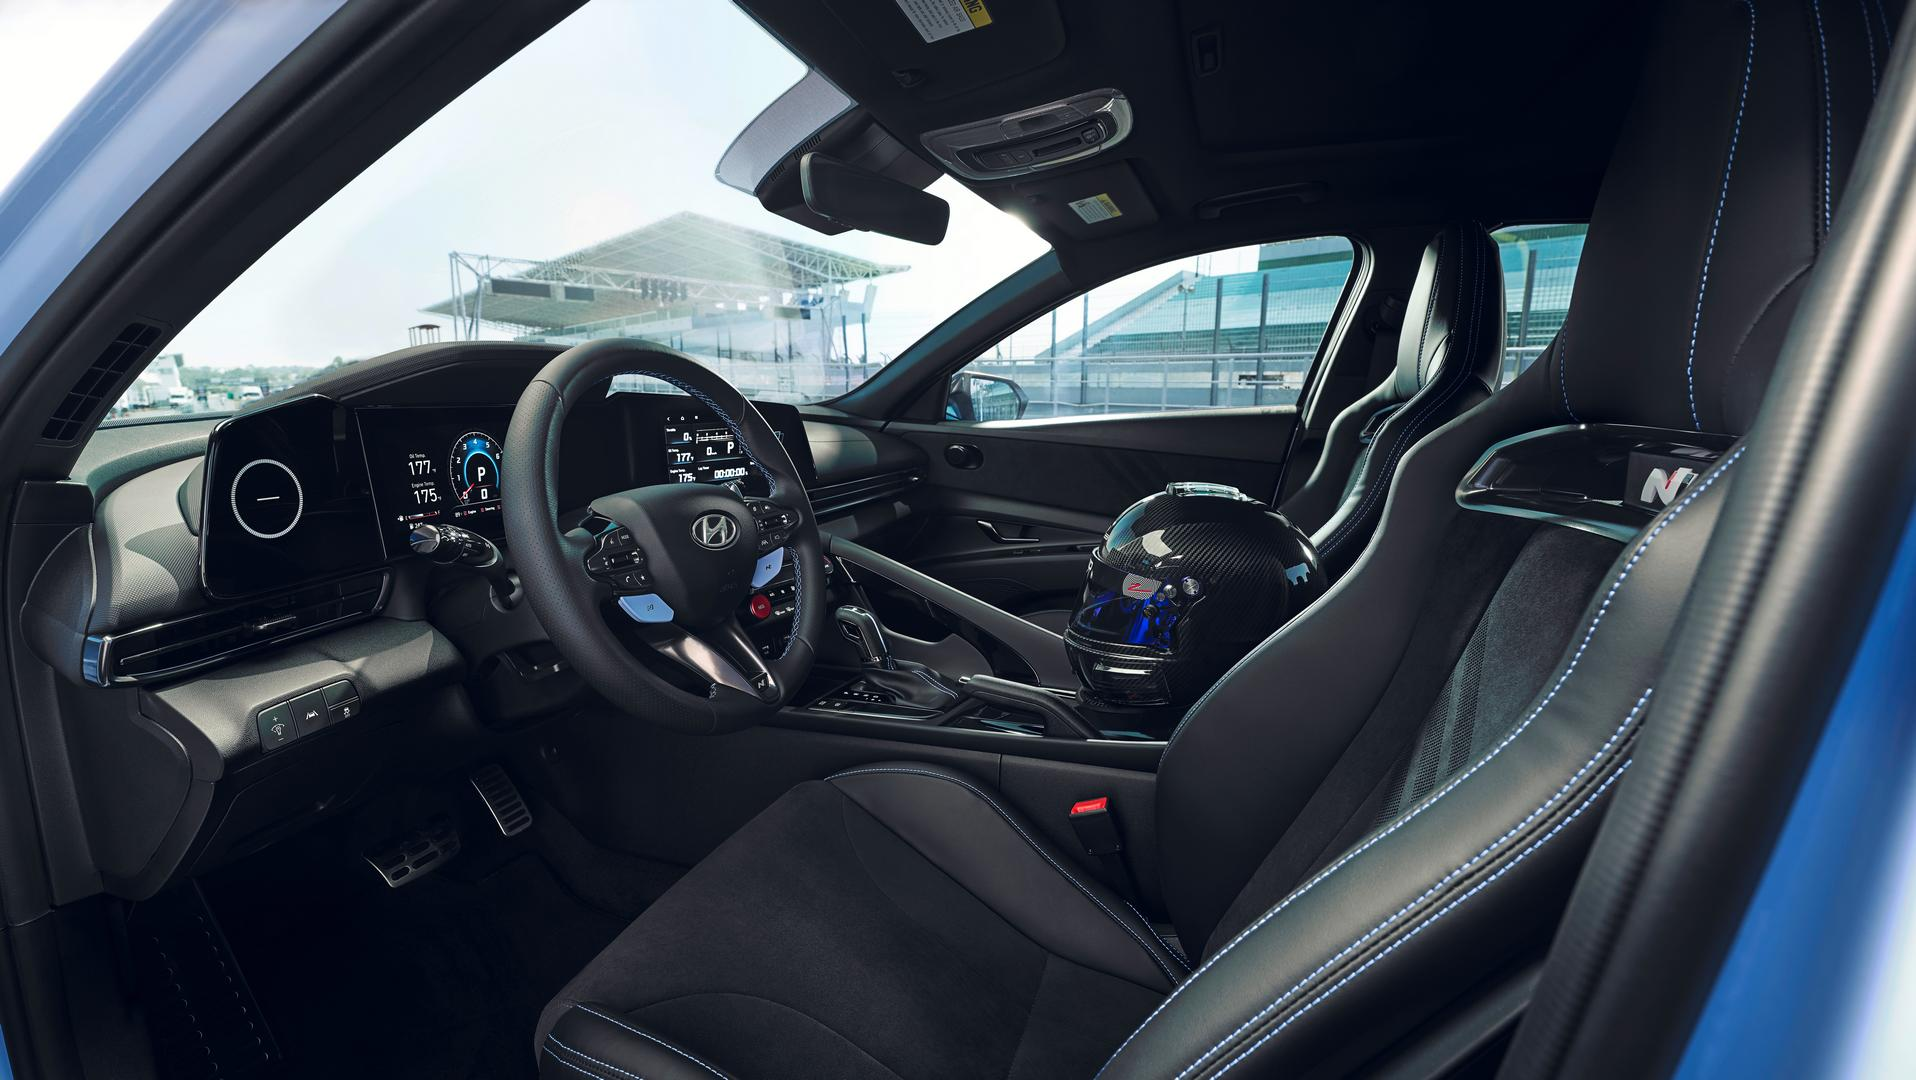 Hyundai Elantra N interior